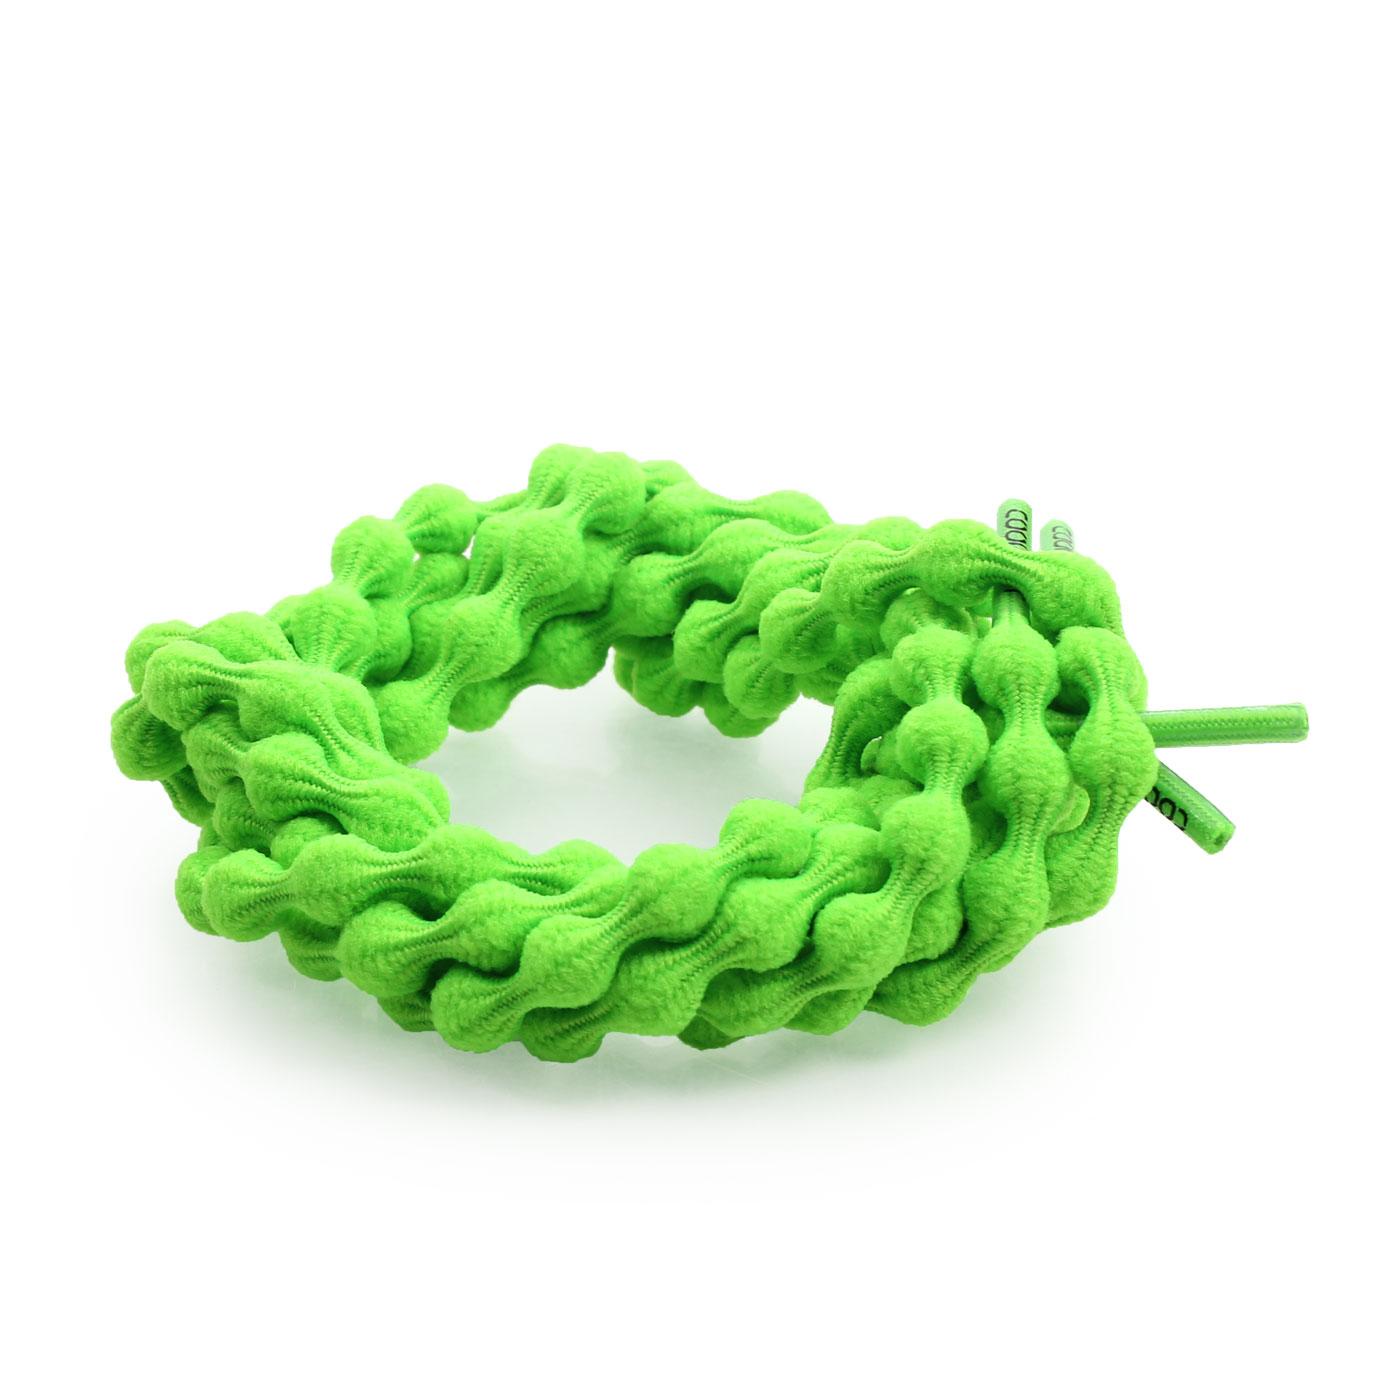 COOLKNOT 豆豆鞋帶(選手款)85CM 6023901 - 螢光綠